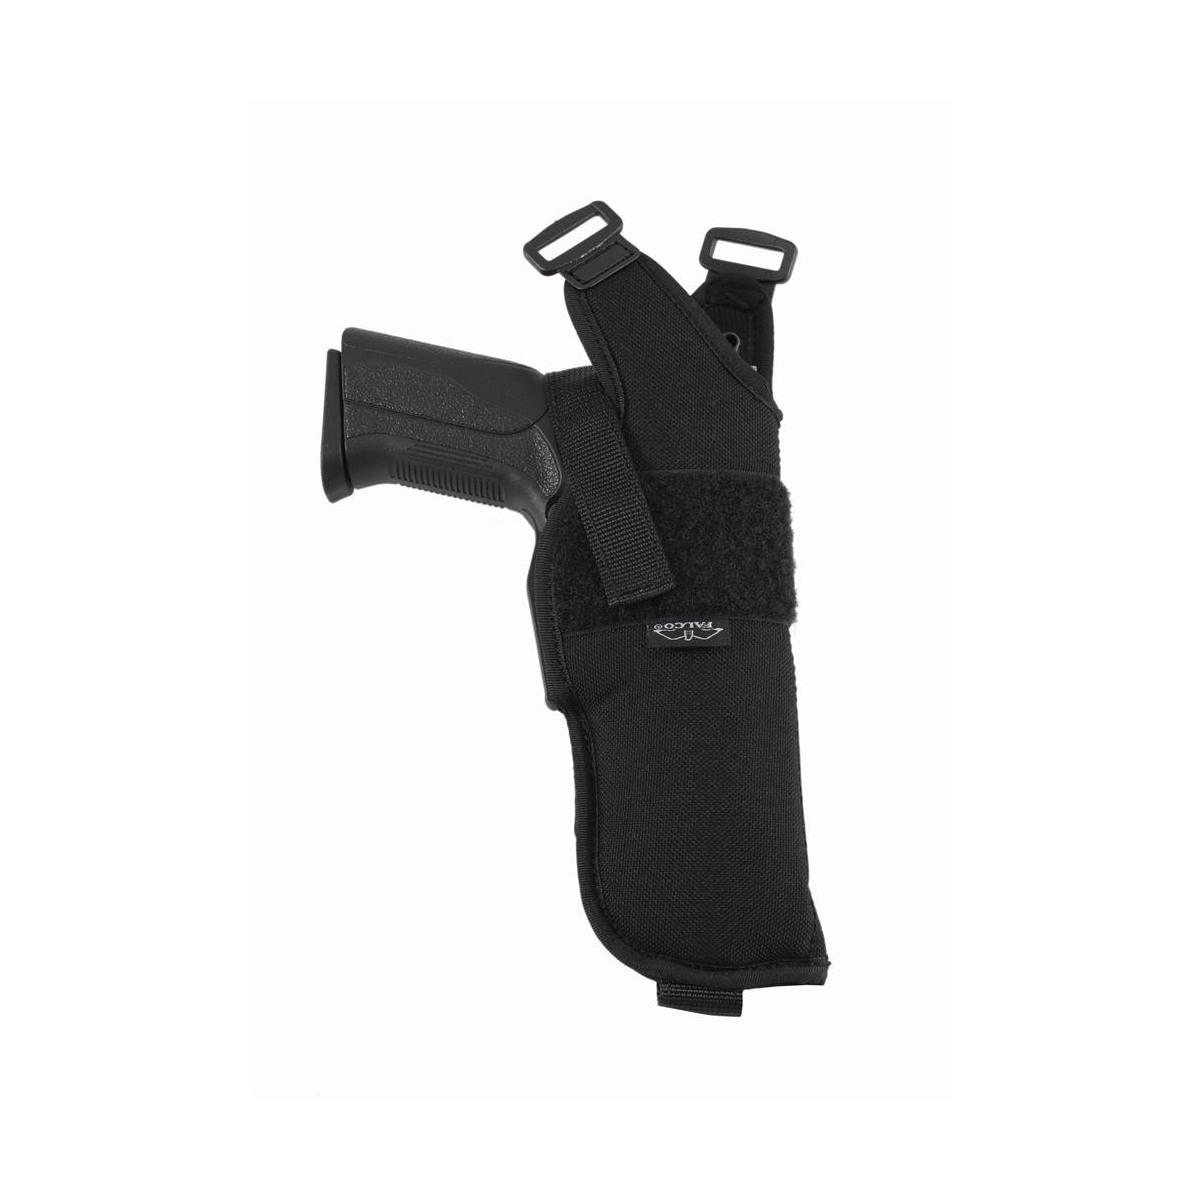 Schulterholster vertikal mit offener Mündung